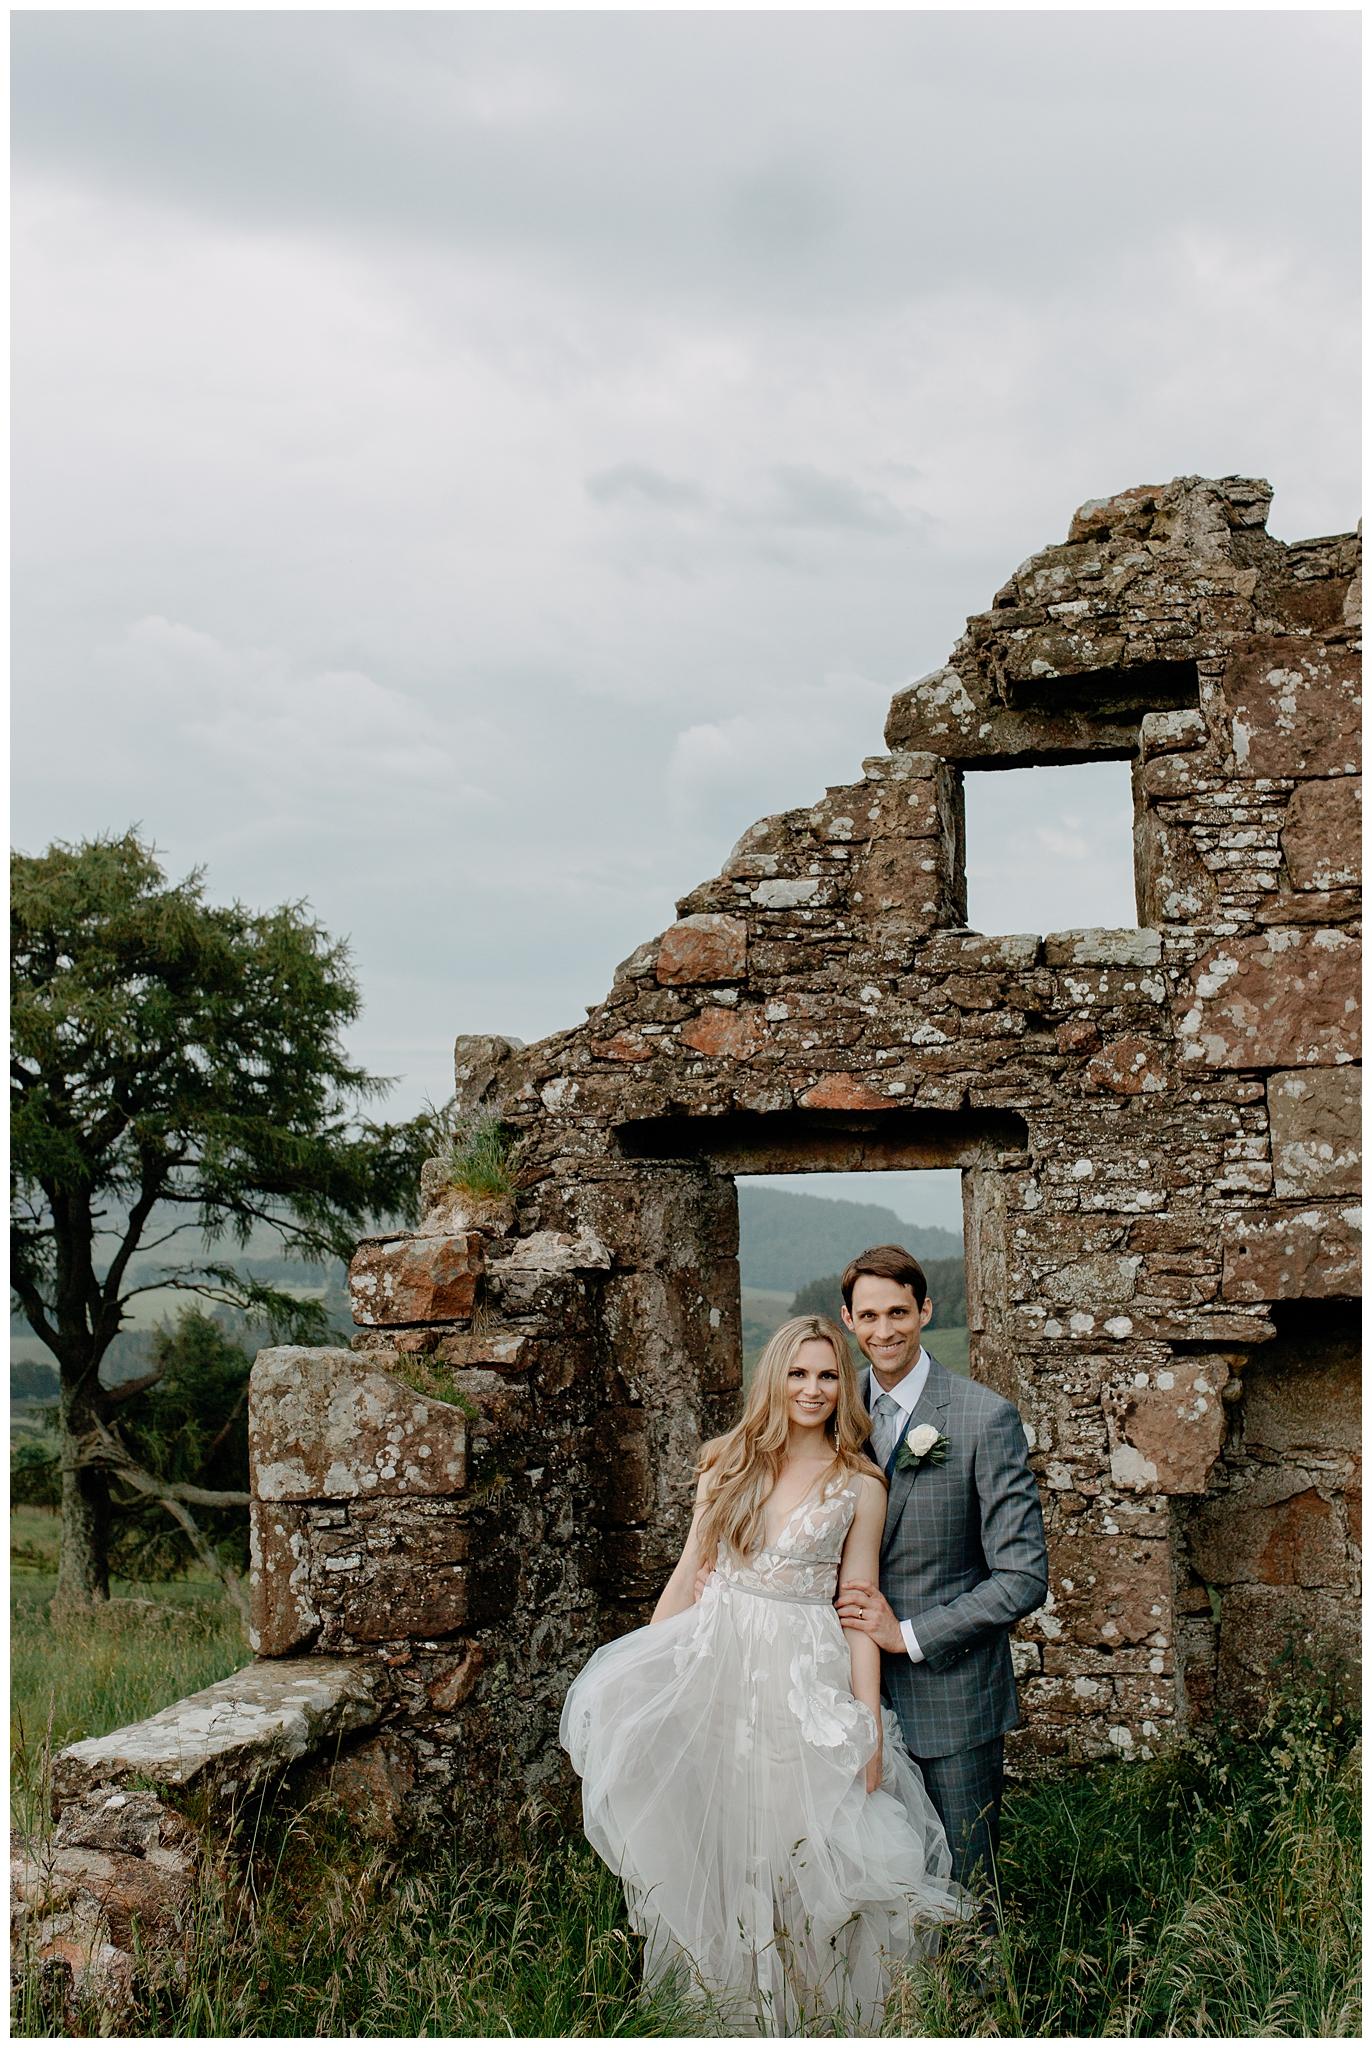 austin-texas-scottish-wedding-bride-groom22004.JPG